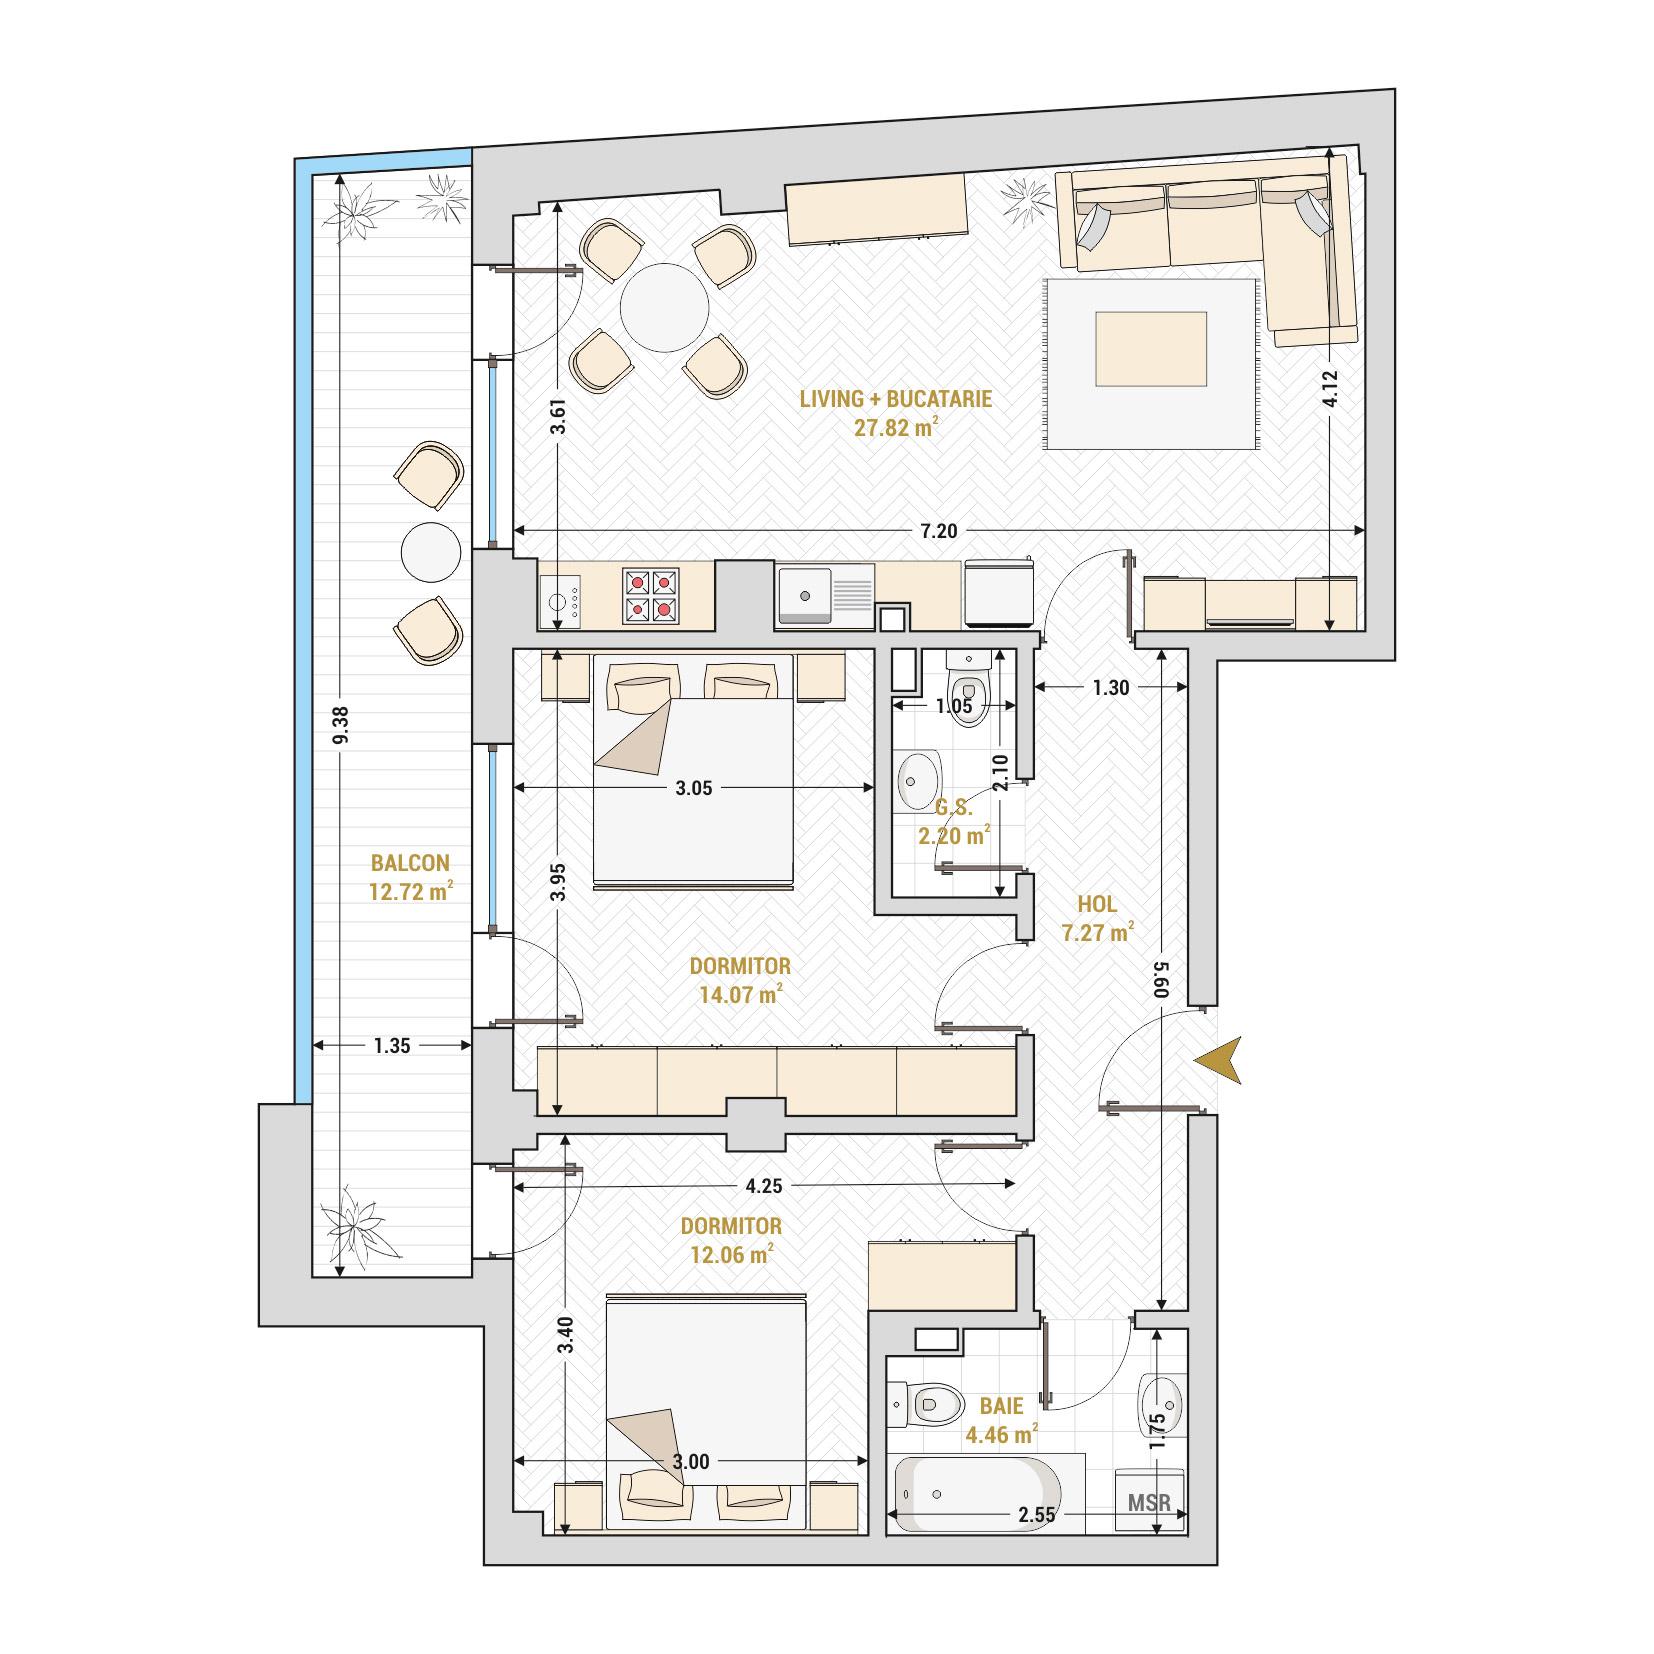 Apartament 3 camere de vanzare Bucuresti - Catedral Residence - Marriott, Piata Unirii, 13 Septembrie, Izvor - Tip 4 - T2